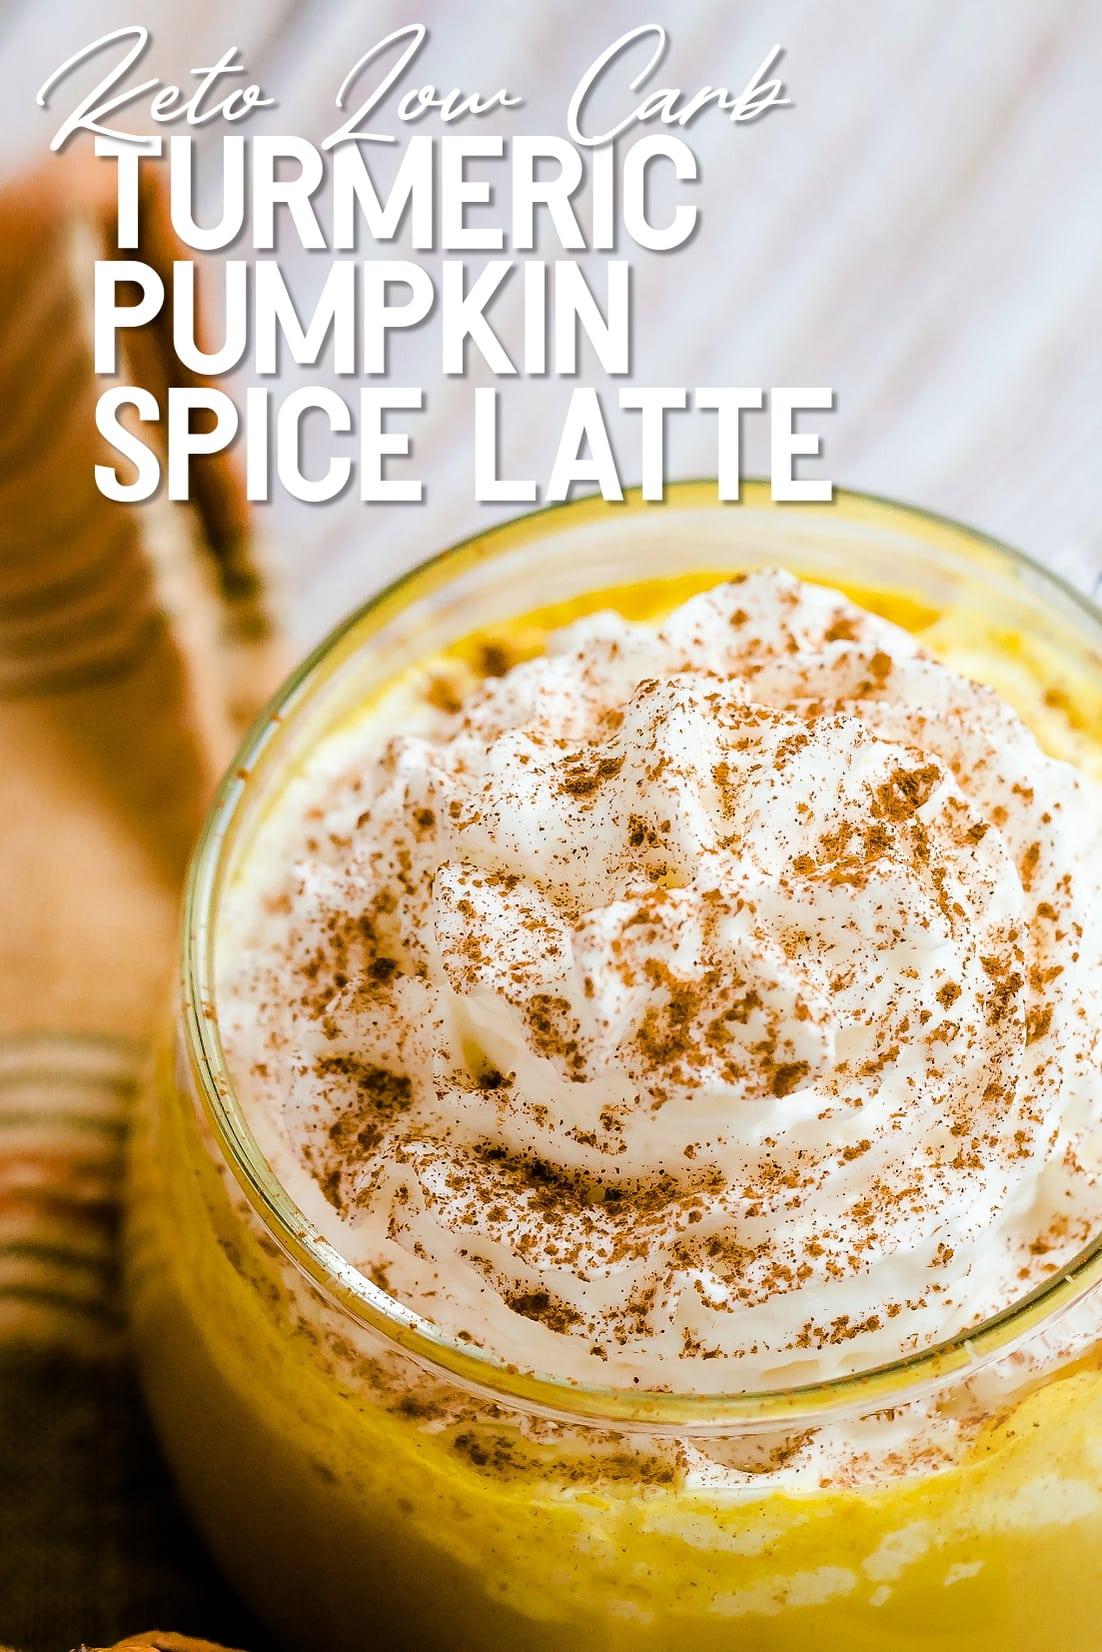 Keto Low Carb Turmeric Pumpkin Spice Latte top down shot